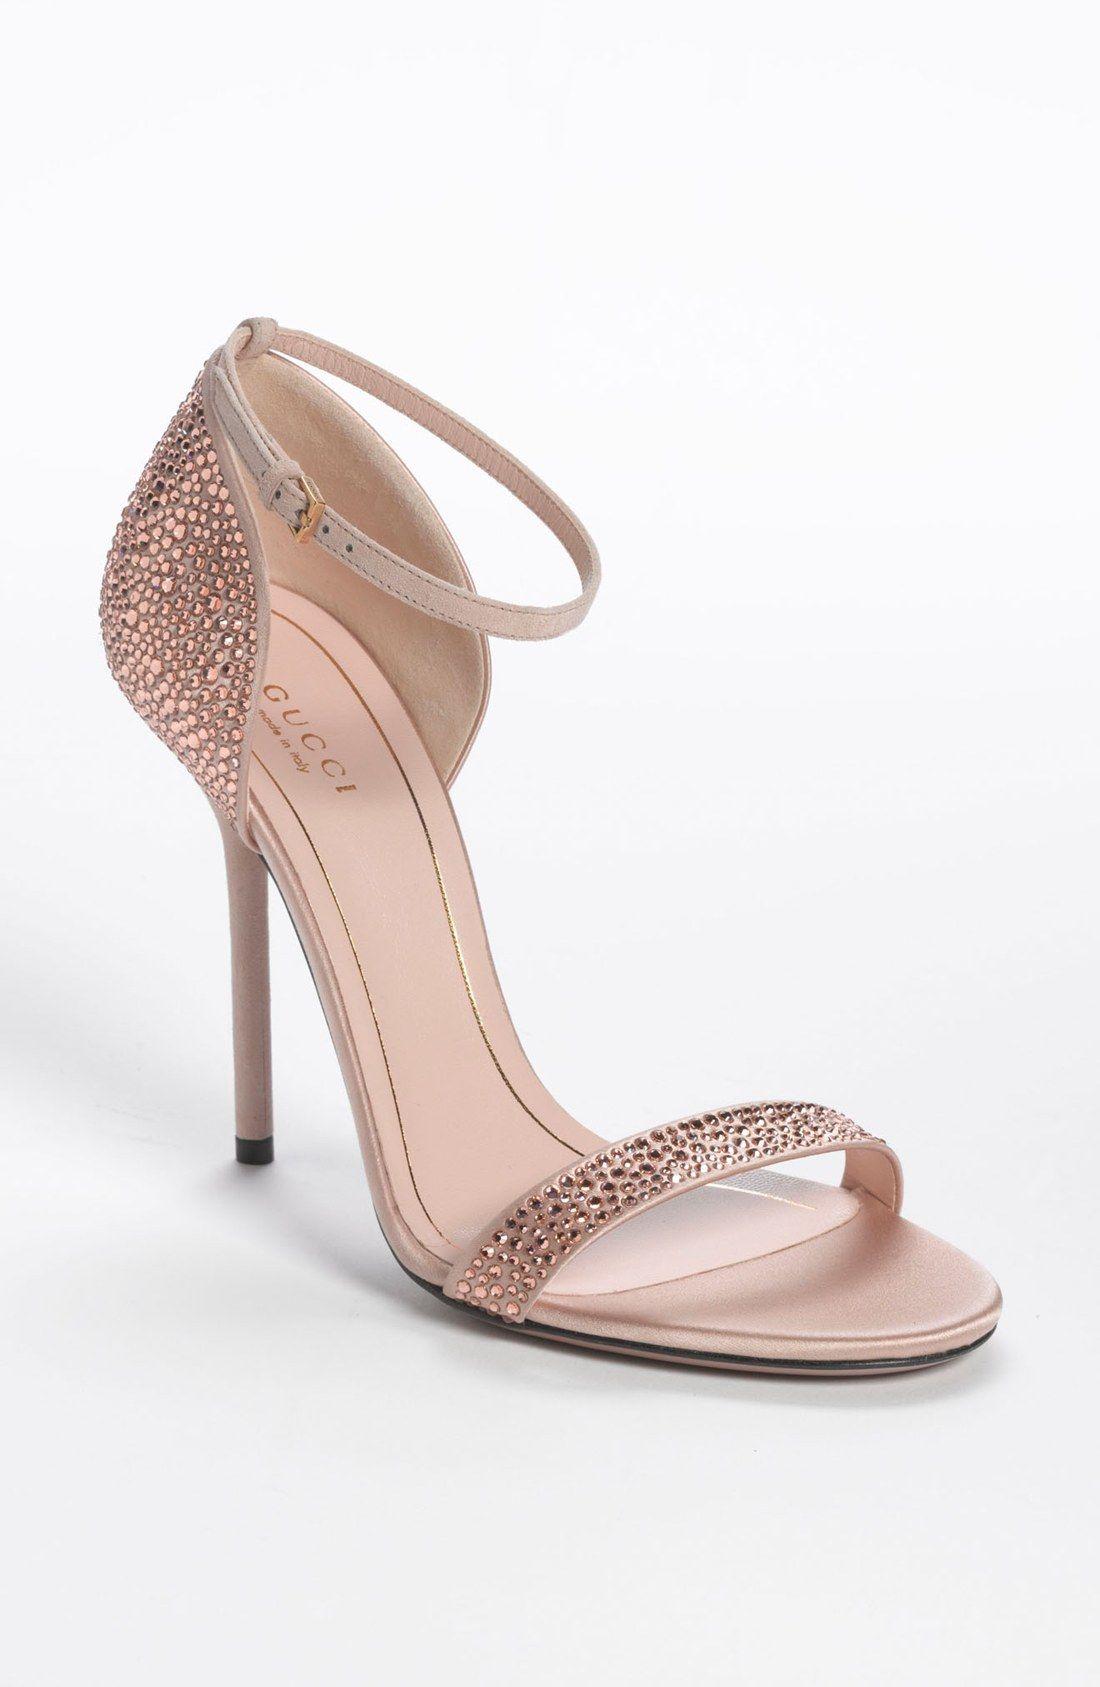 a1ba5585d0d Wedding Shoes and Bridal Shoes. Gucci  Noah  Crystal Sandal For Women